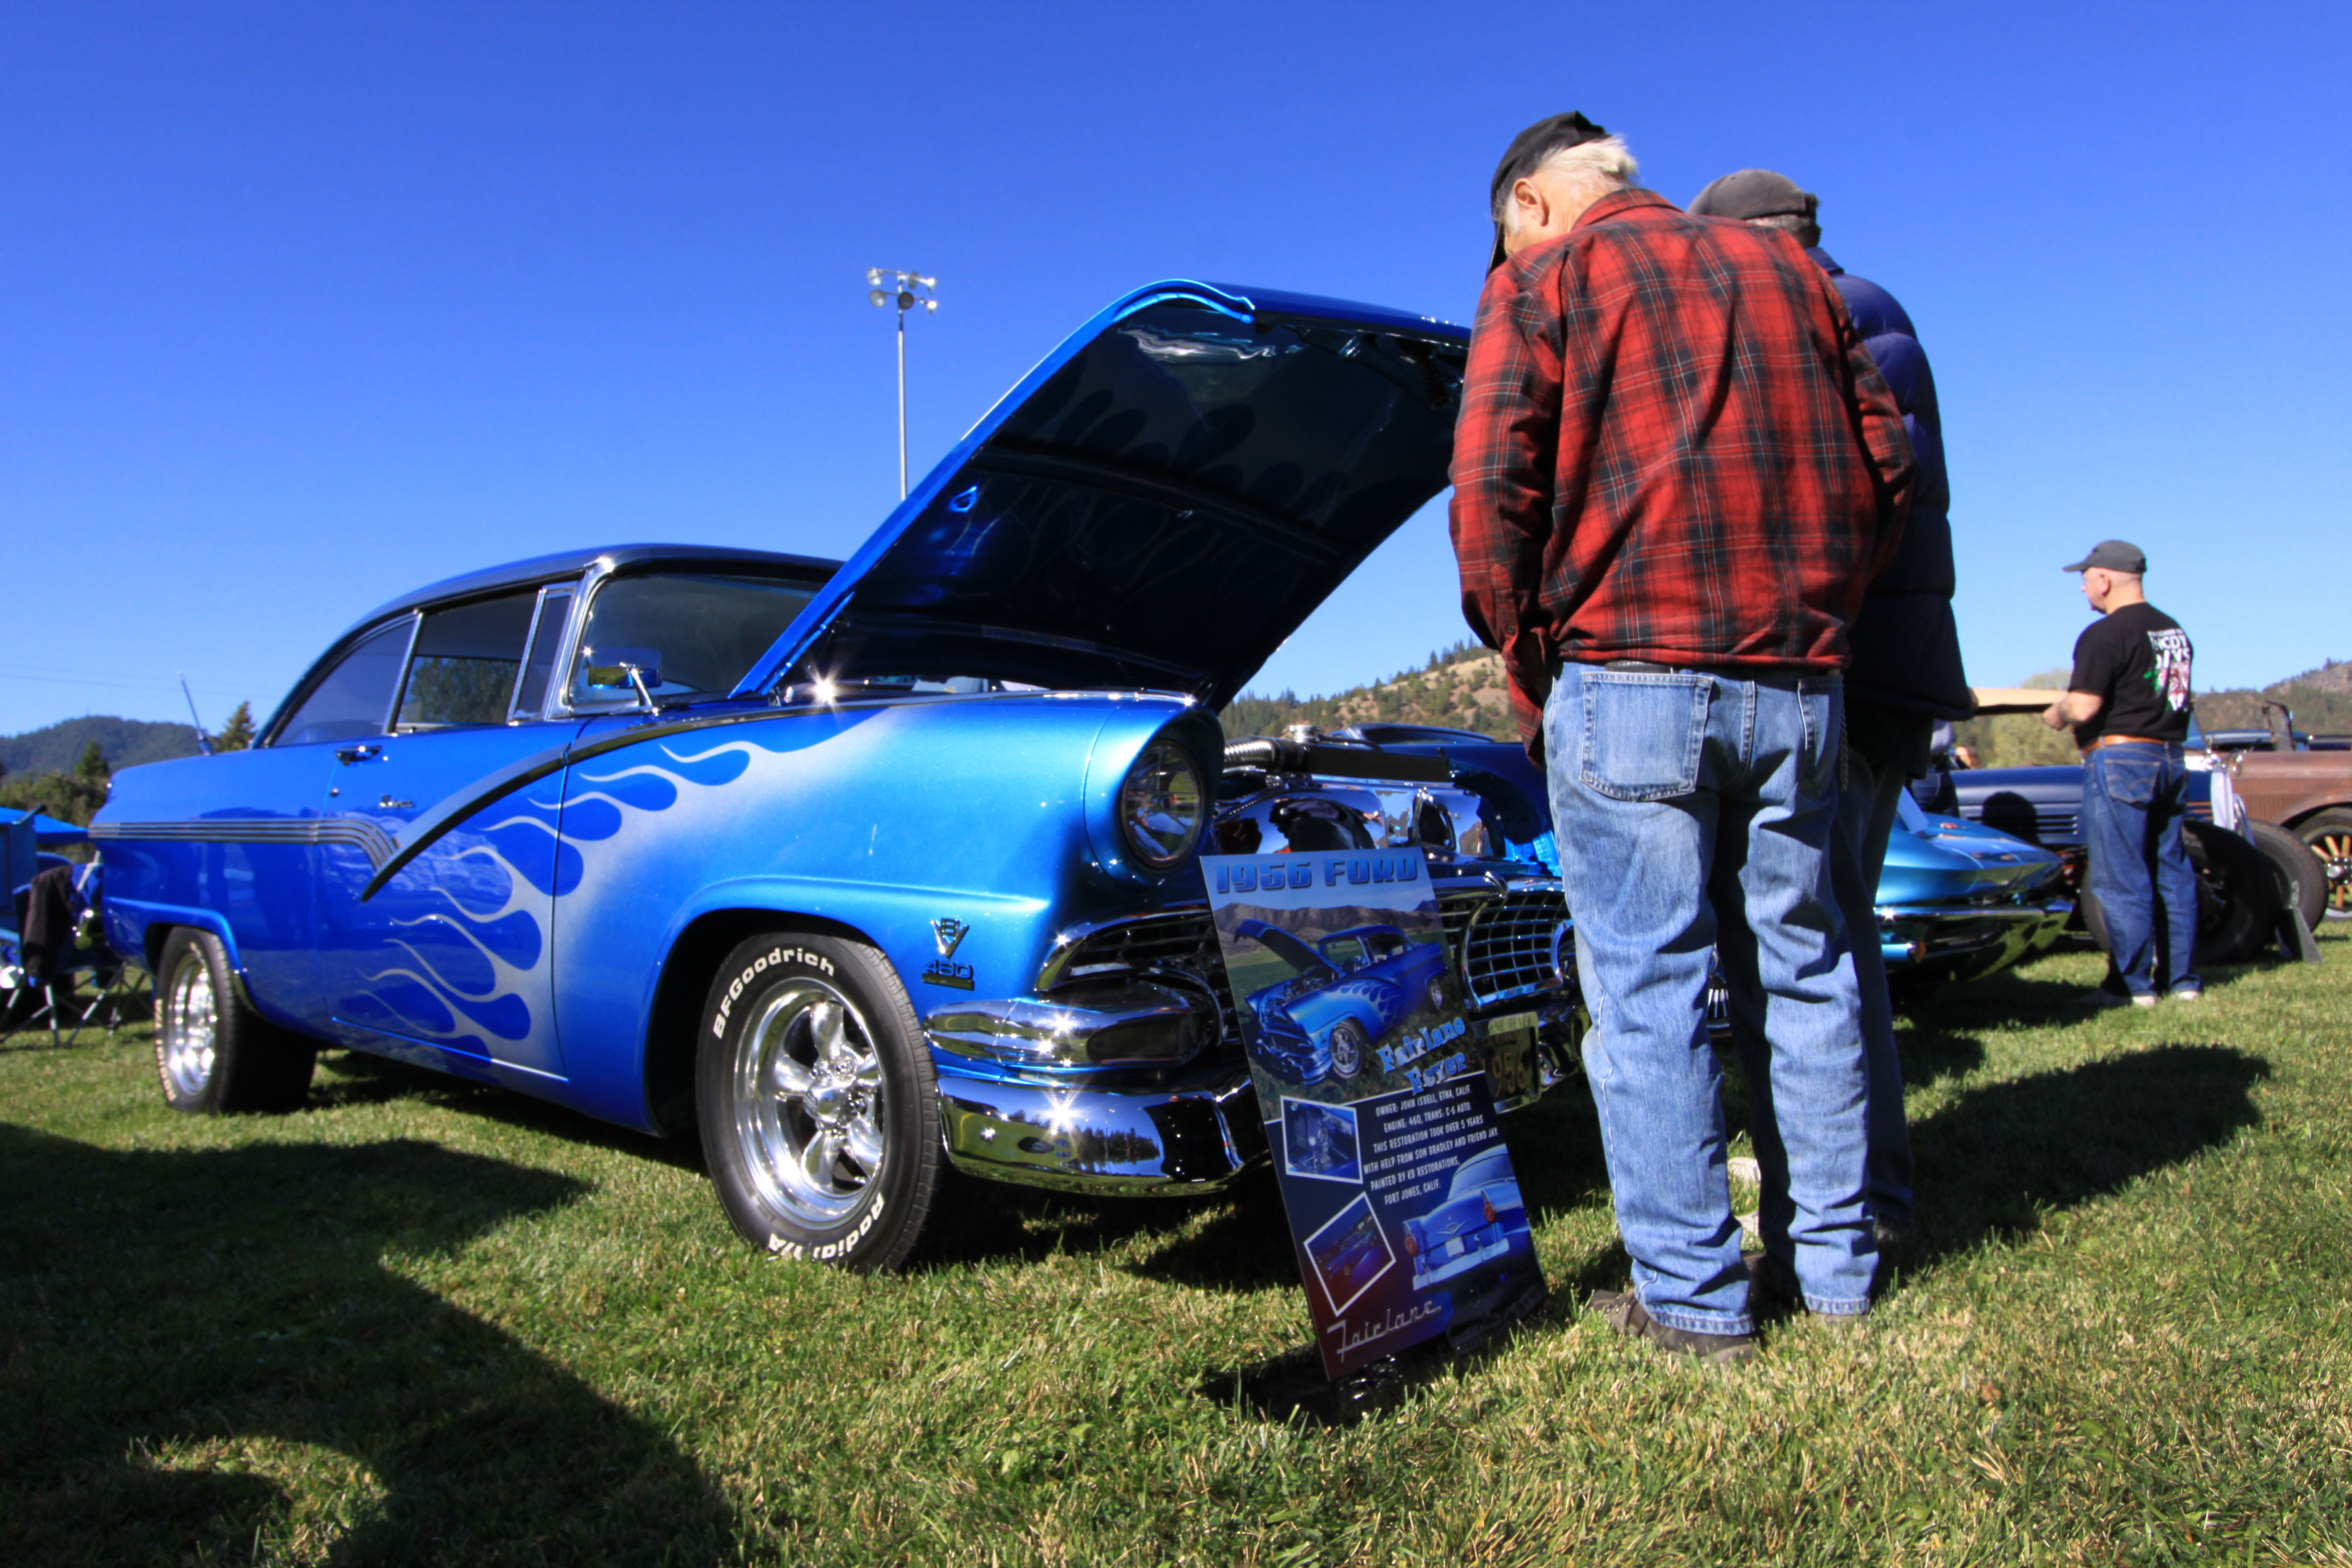 Classic Car Show FortJones & Fort Jones Classic Car Show u2013 Malia Plevney markmcfarlin.com